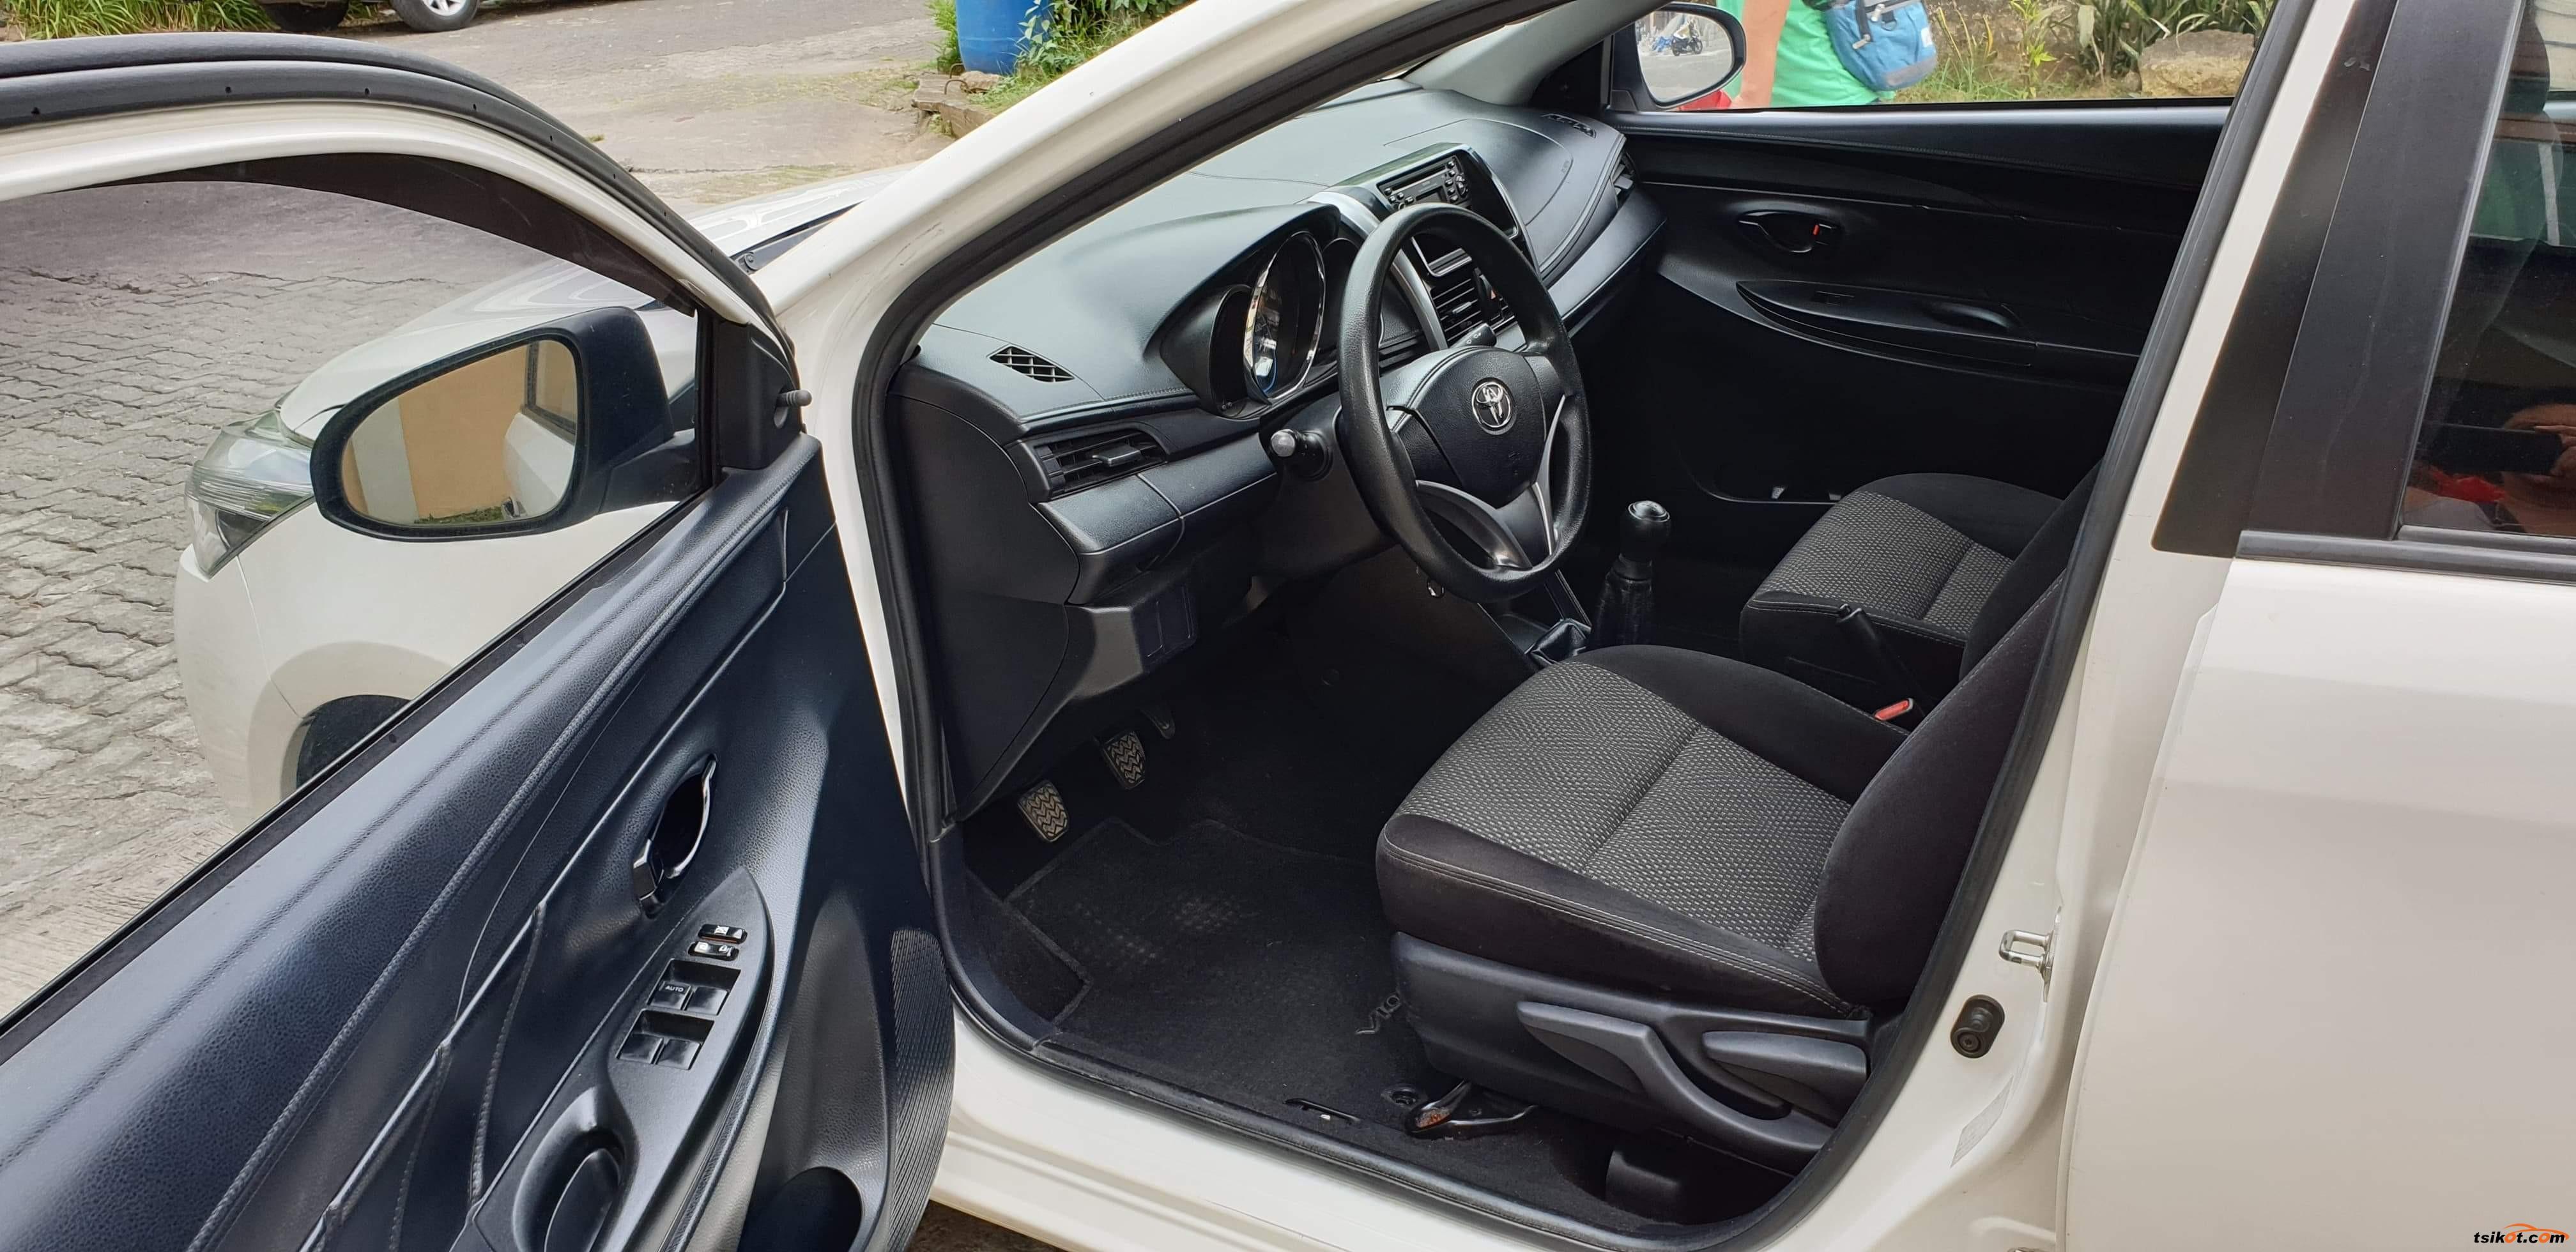 Toyota Vios 2014 - 3